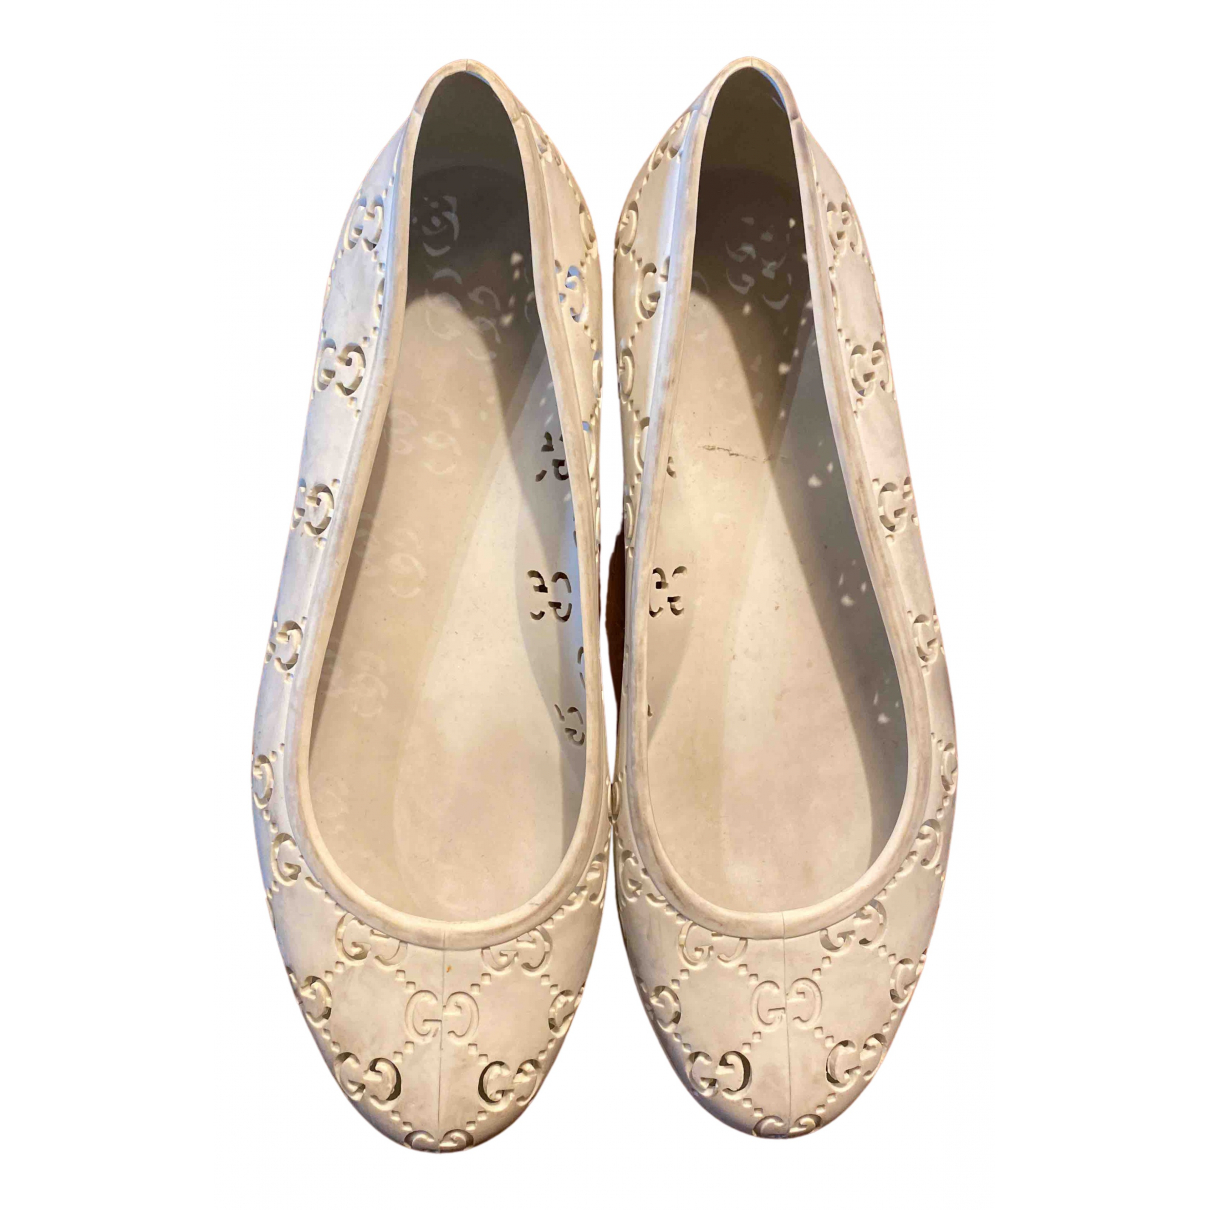 Gucci N White Ballet flats for Women 38 EU